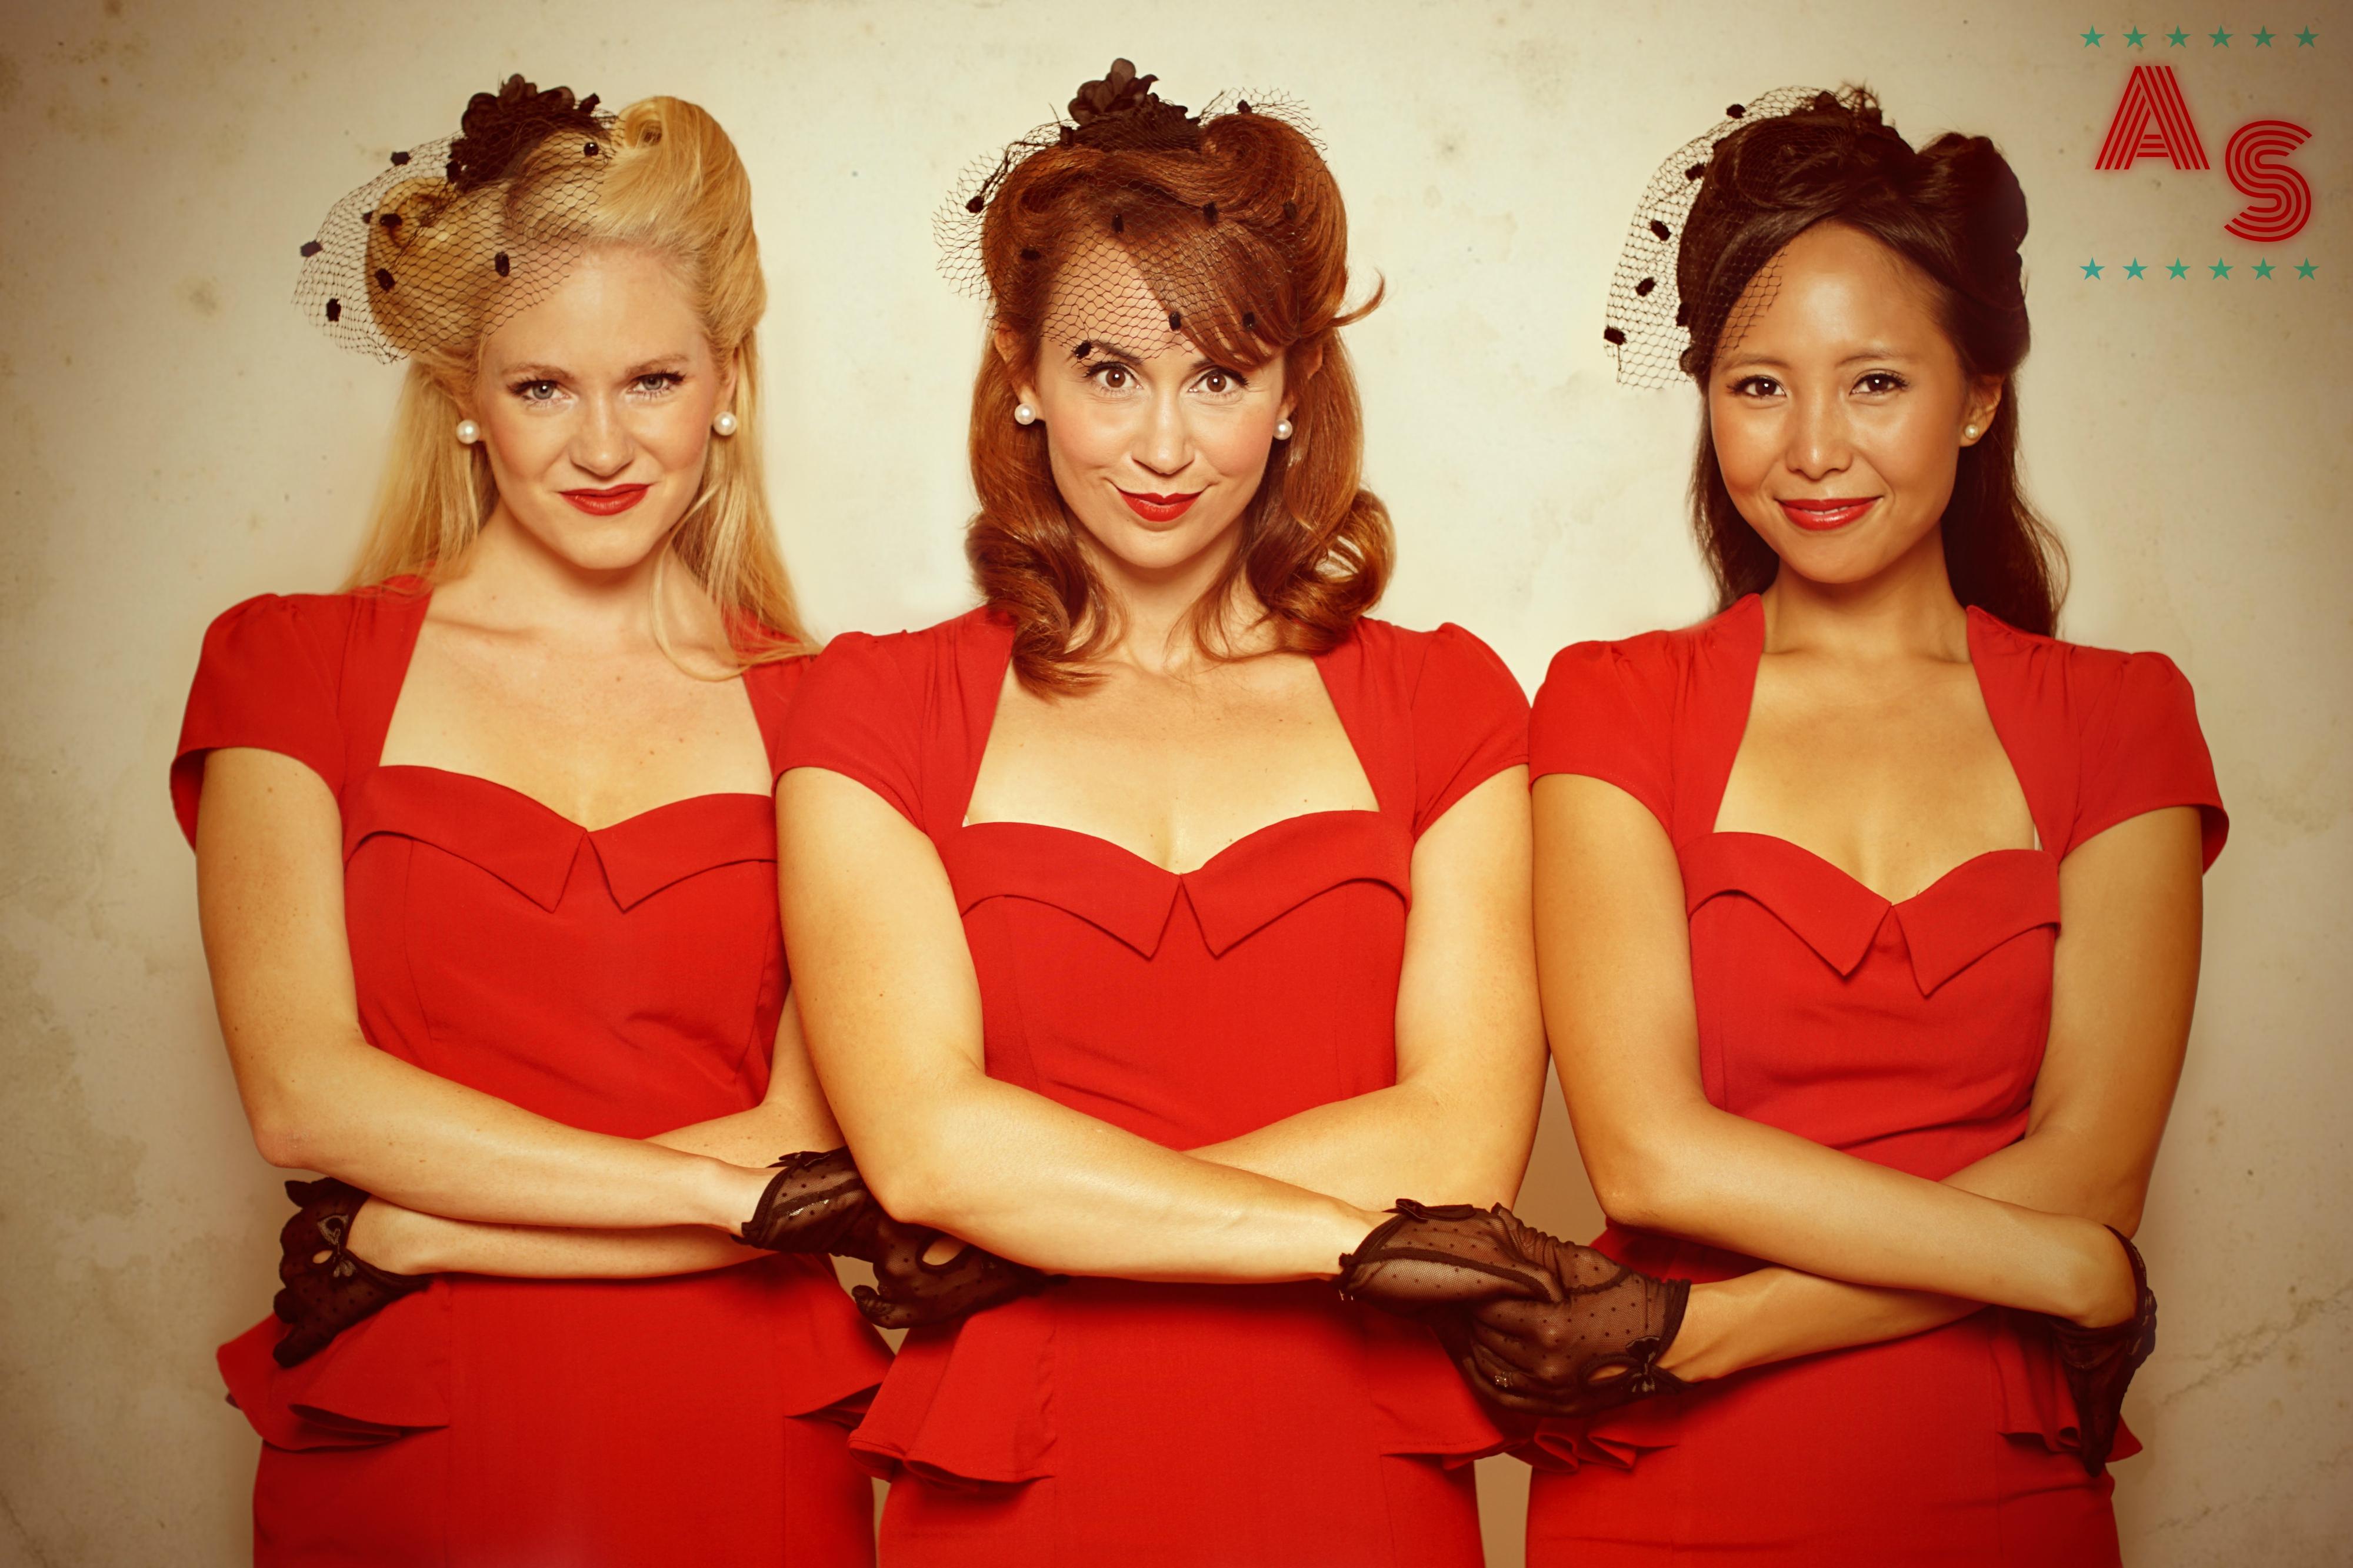 Marissa, Ashleigh, and Emily